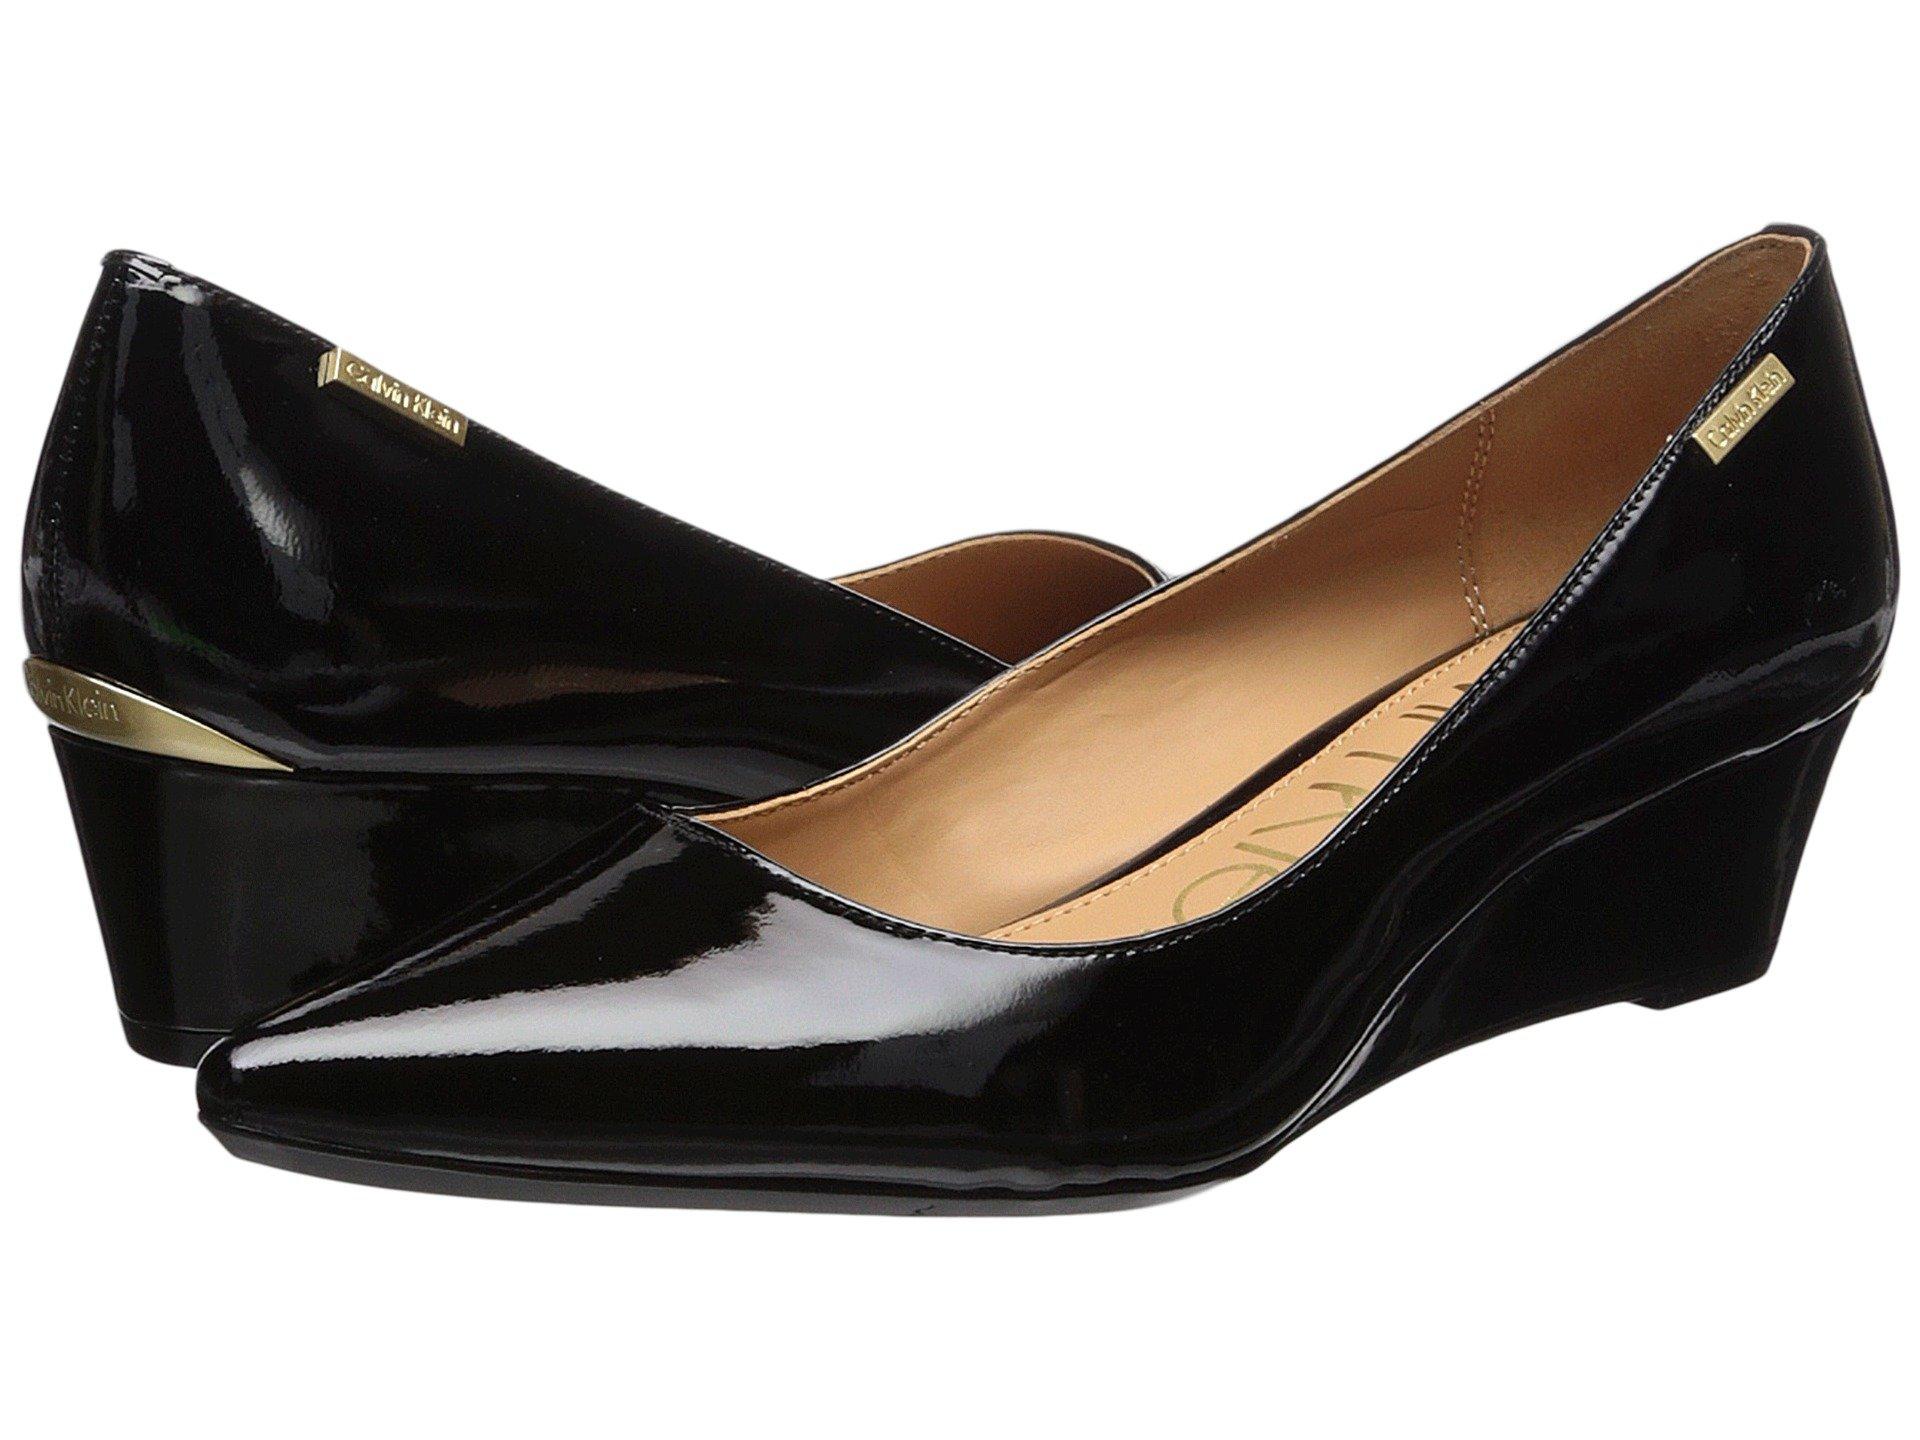 d8da6d6b95ed Women s Calvin Klein Shoes + FREE SHIPPING